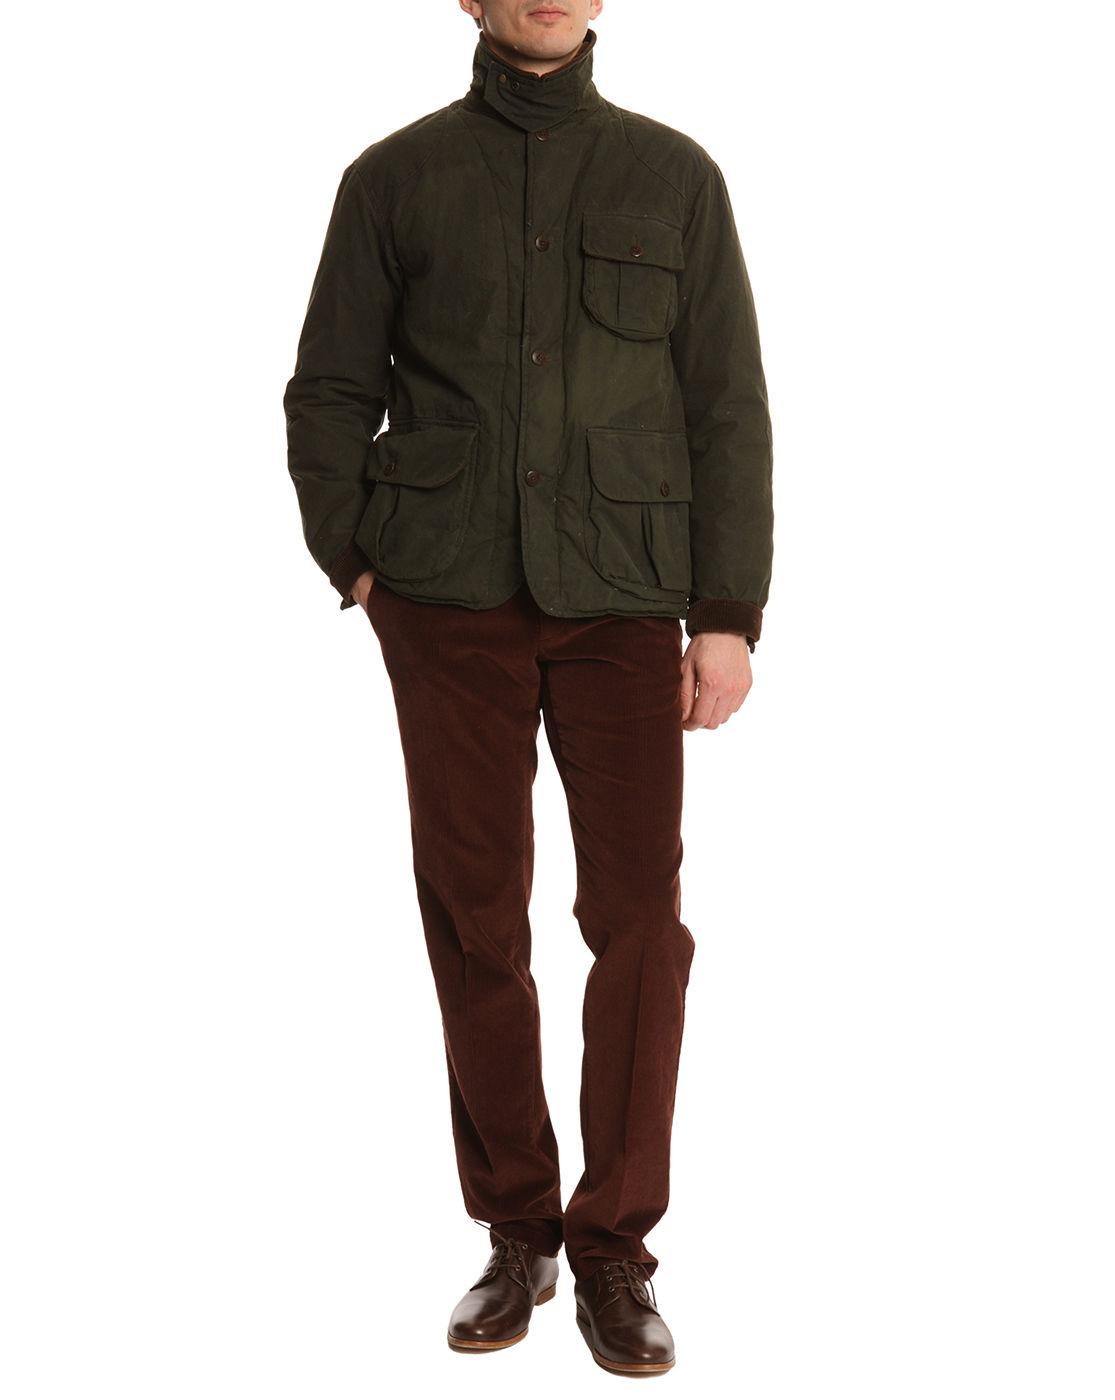 Polo ralph lauren Stretch Burgundy Brown Velvet Corduroy Trousers ...